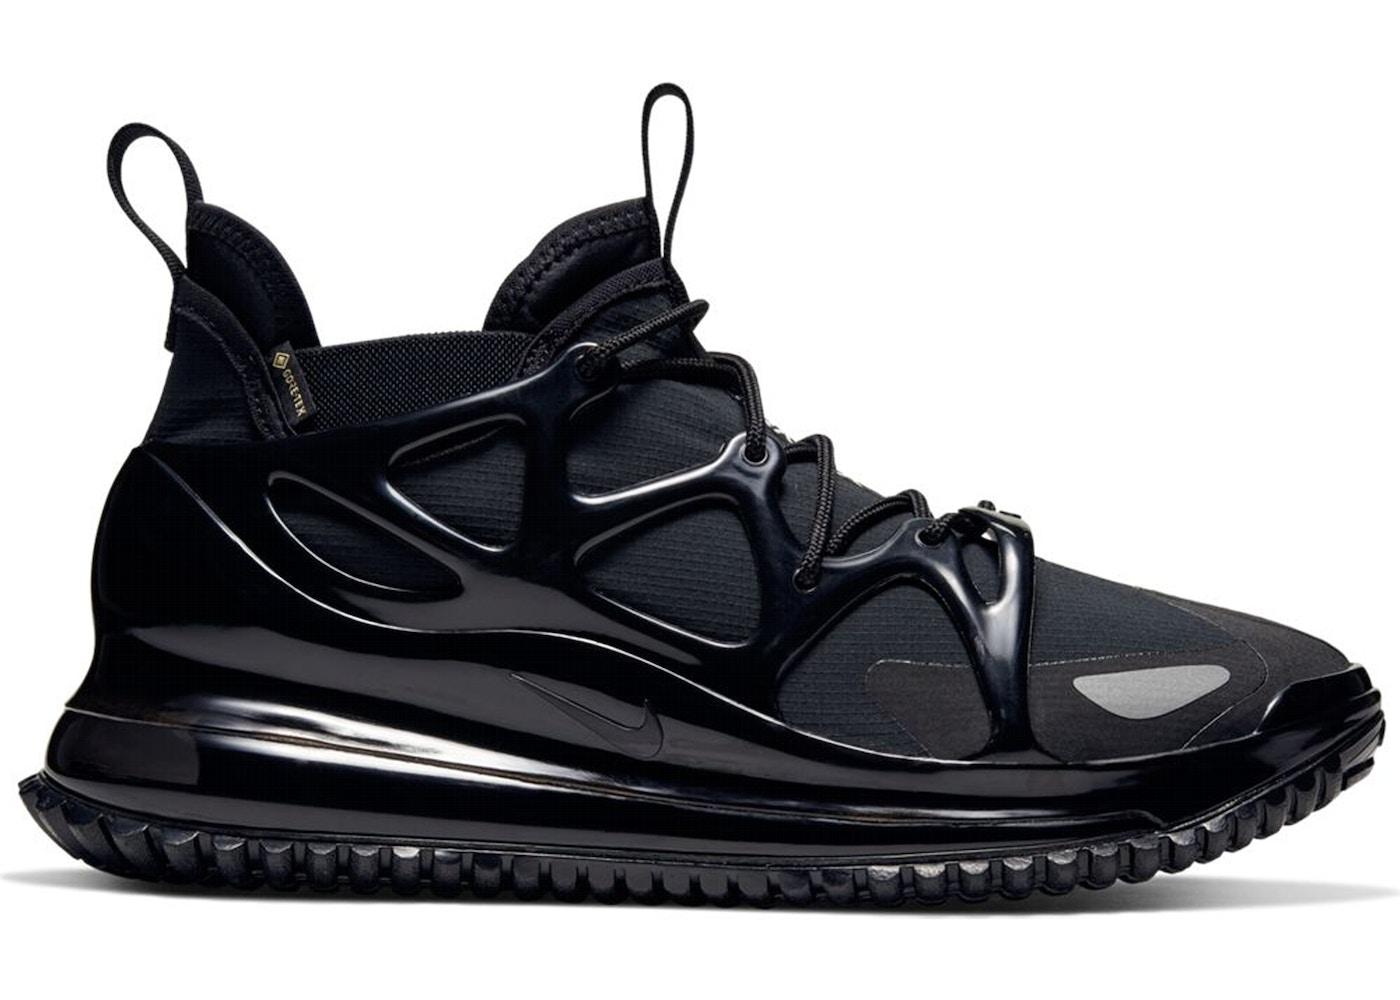 Nike Air Max 720 Horizon Black